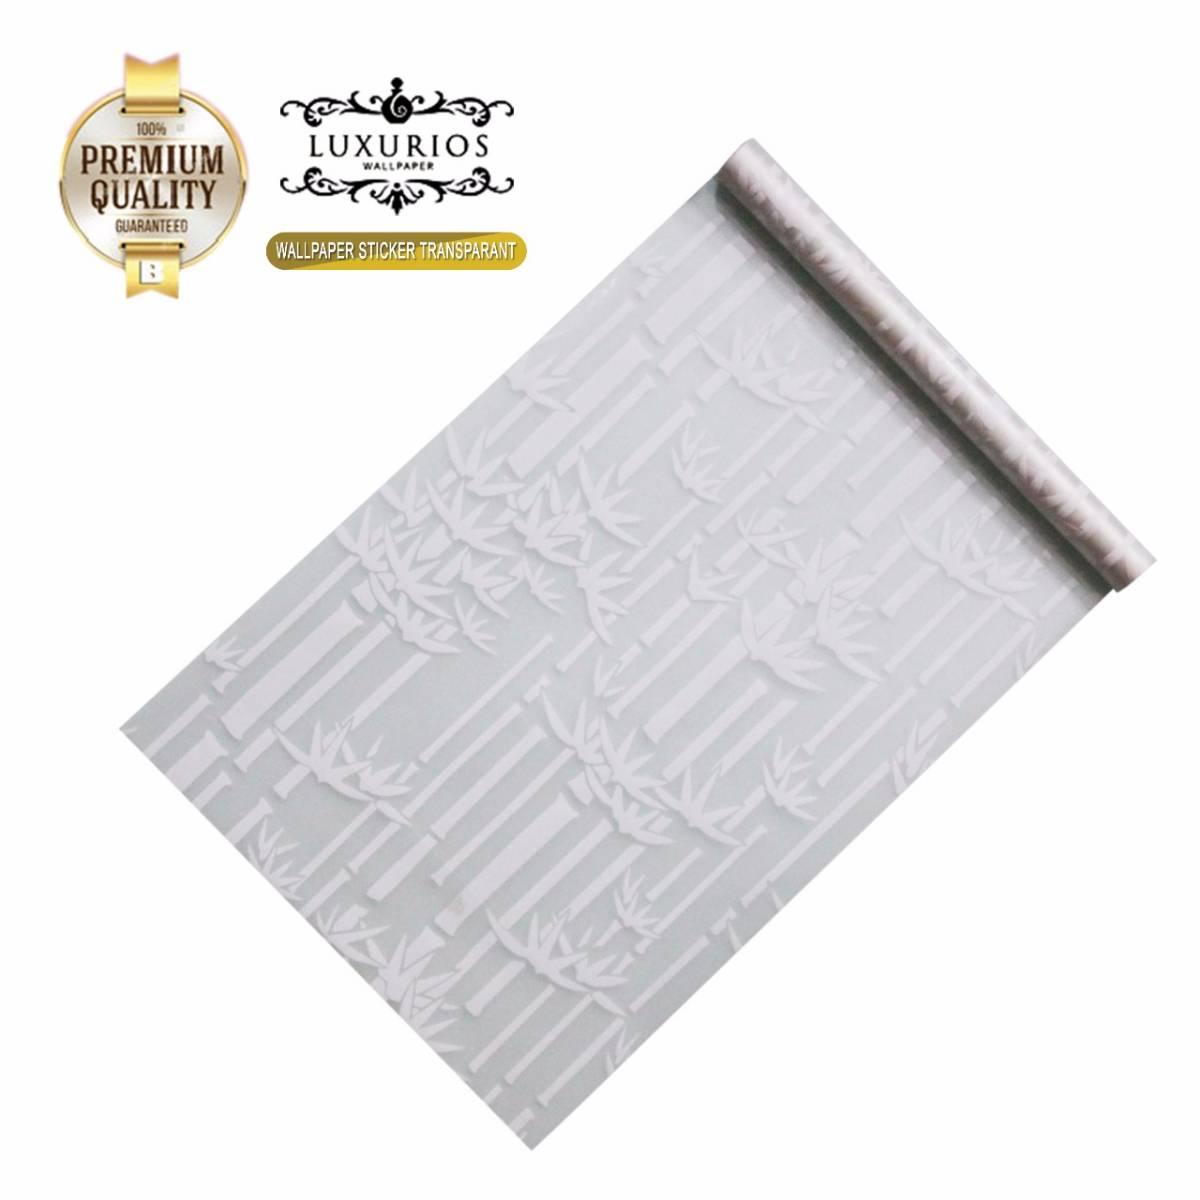 Window Sticker 45cm x 5m Stiker Kaca Motif Bambu | WS 5-014